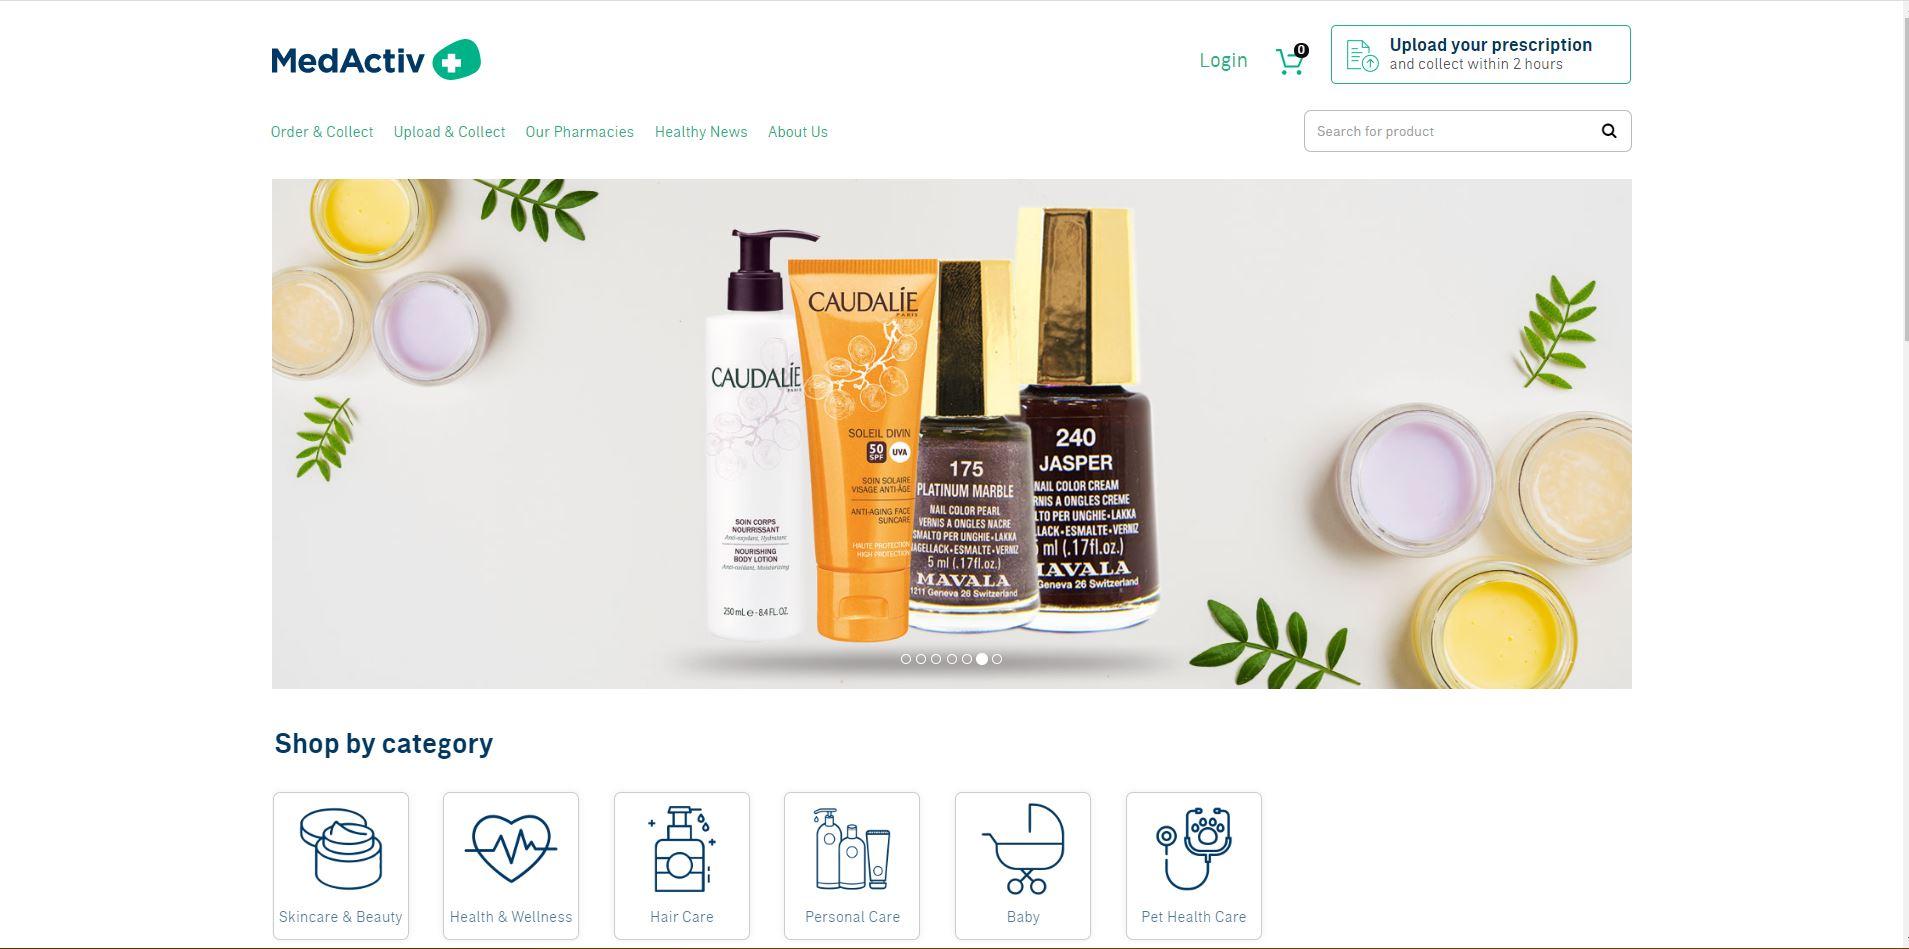 Med-Active-Digital-Marketing-Mauritius-E-commerce